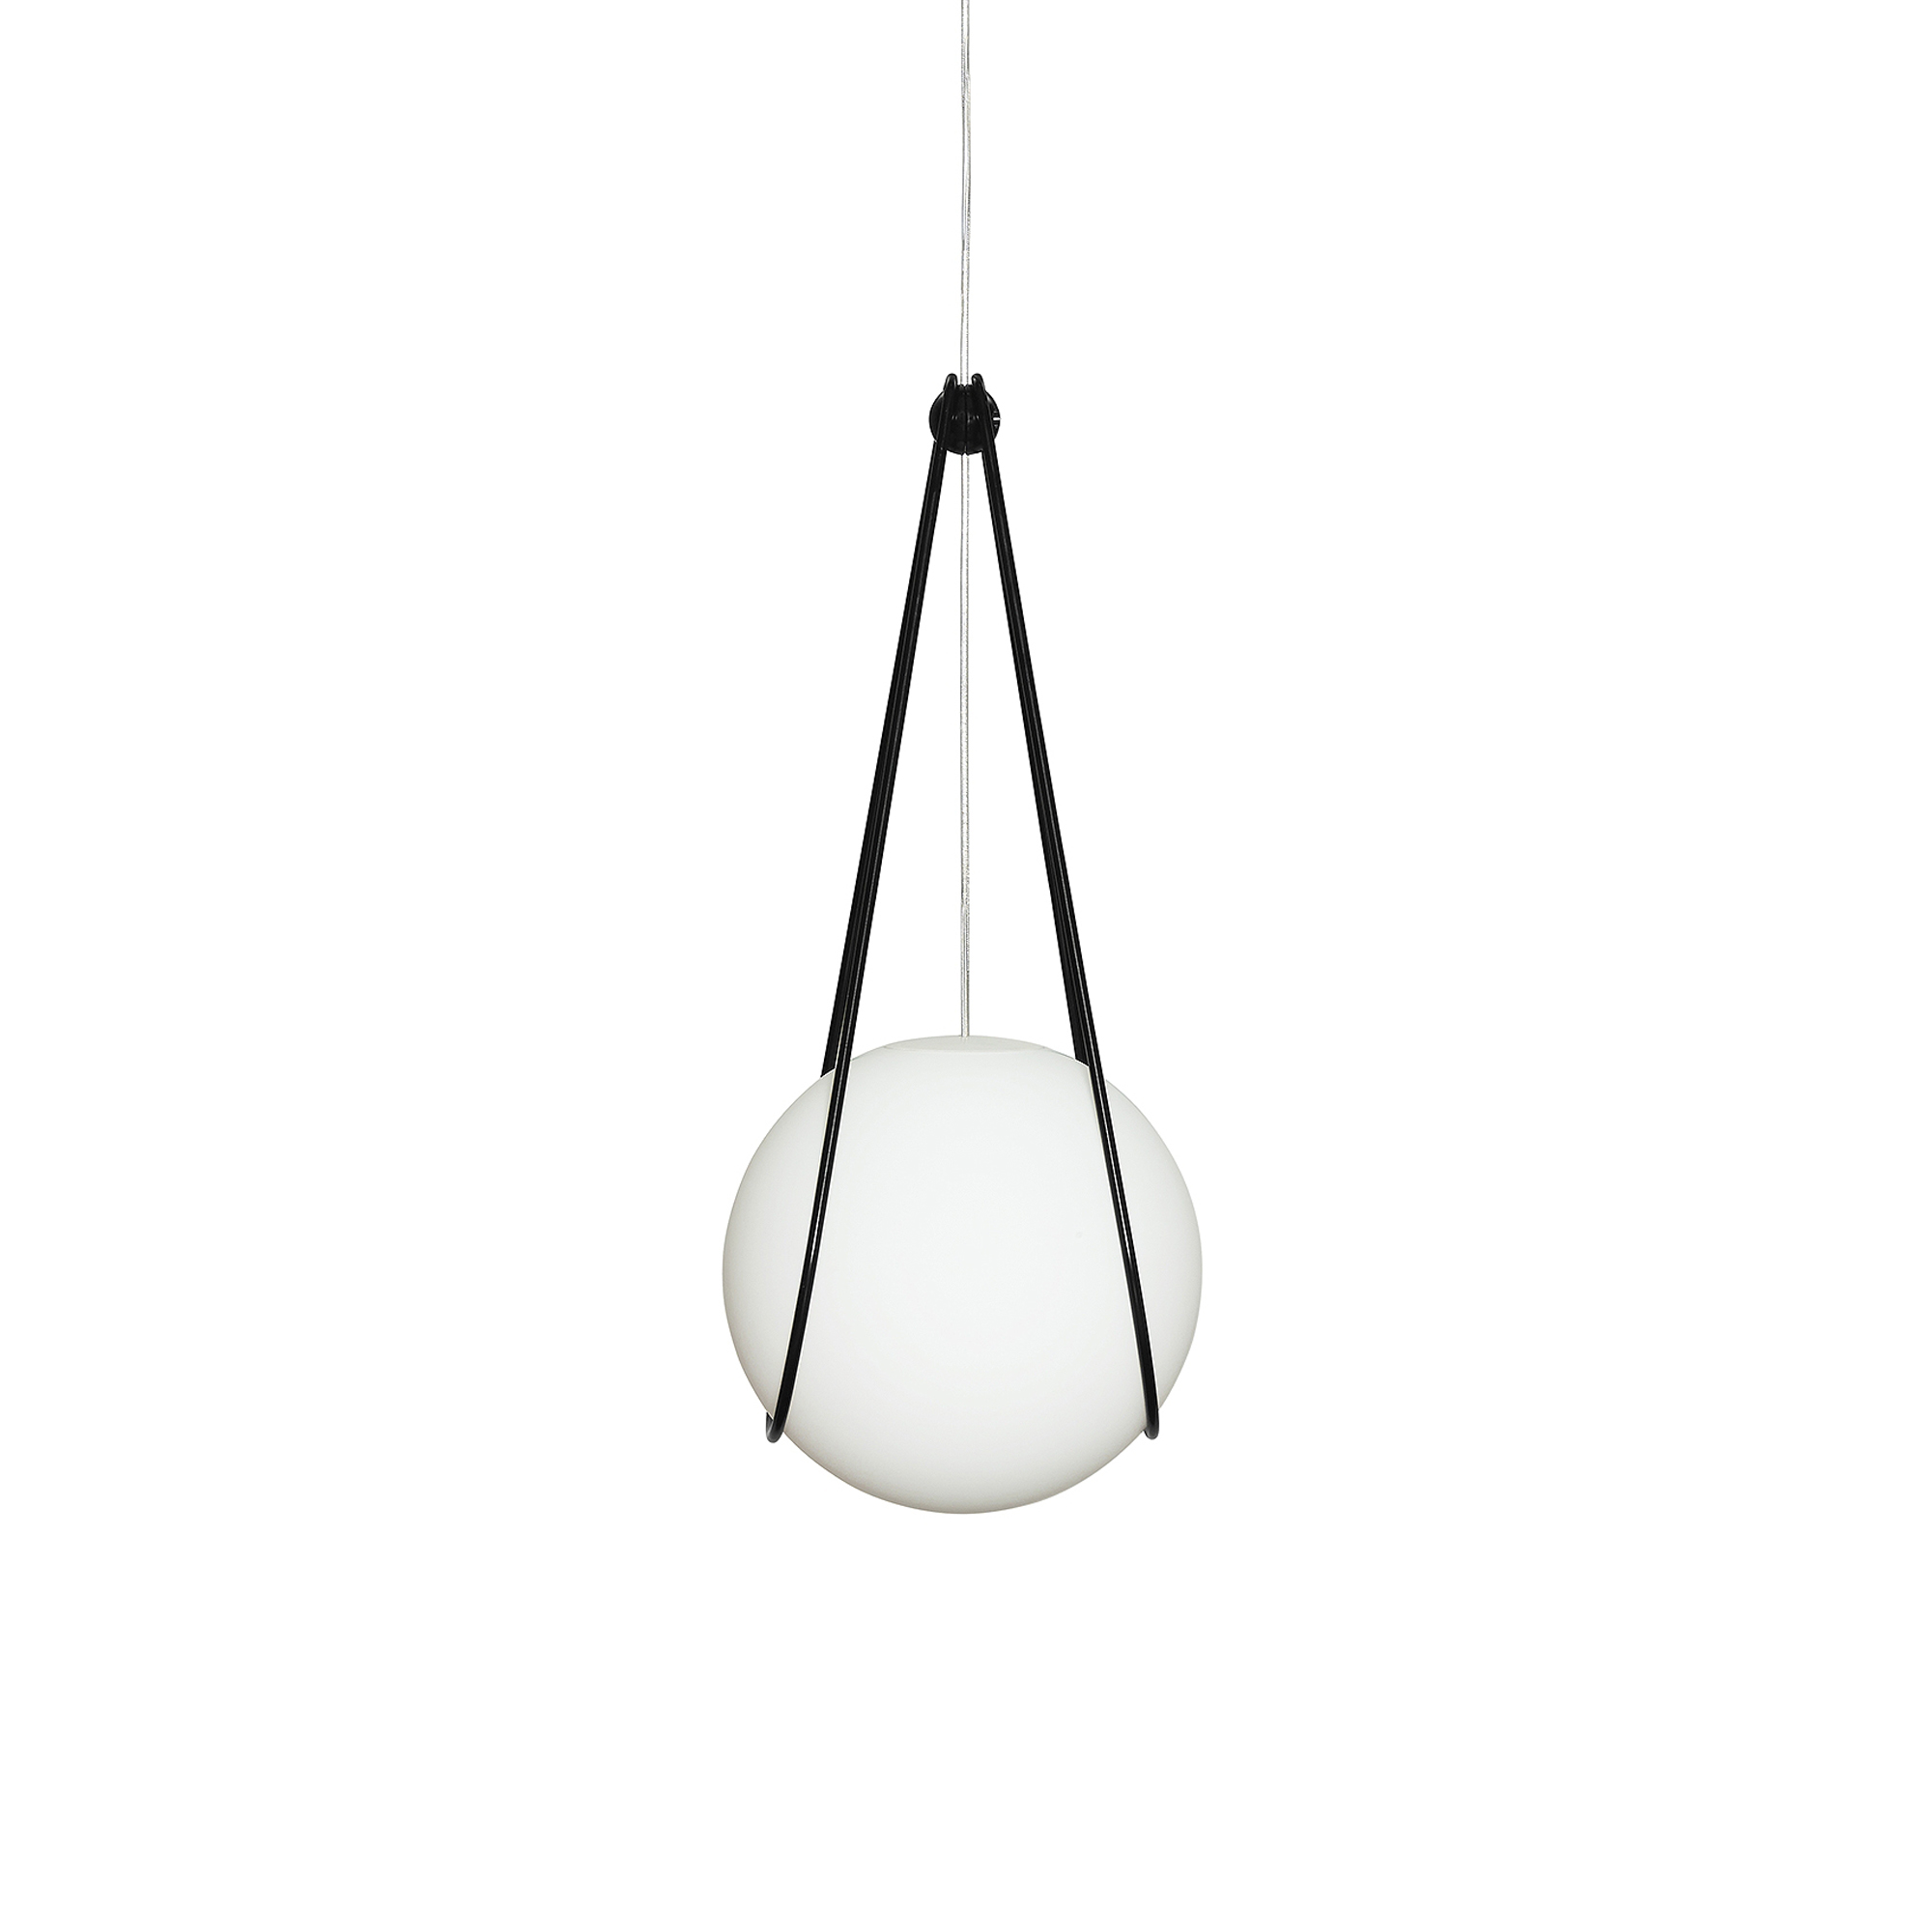 Design House Stockholm Lamphållare Kosmos 300mm svart